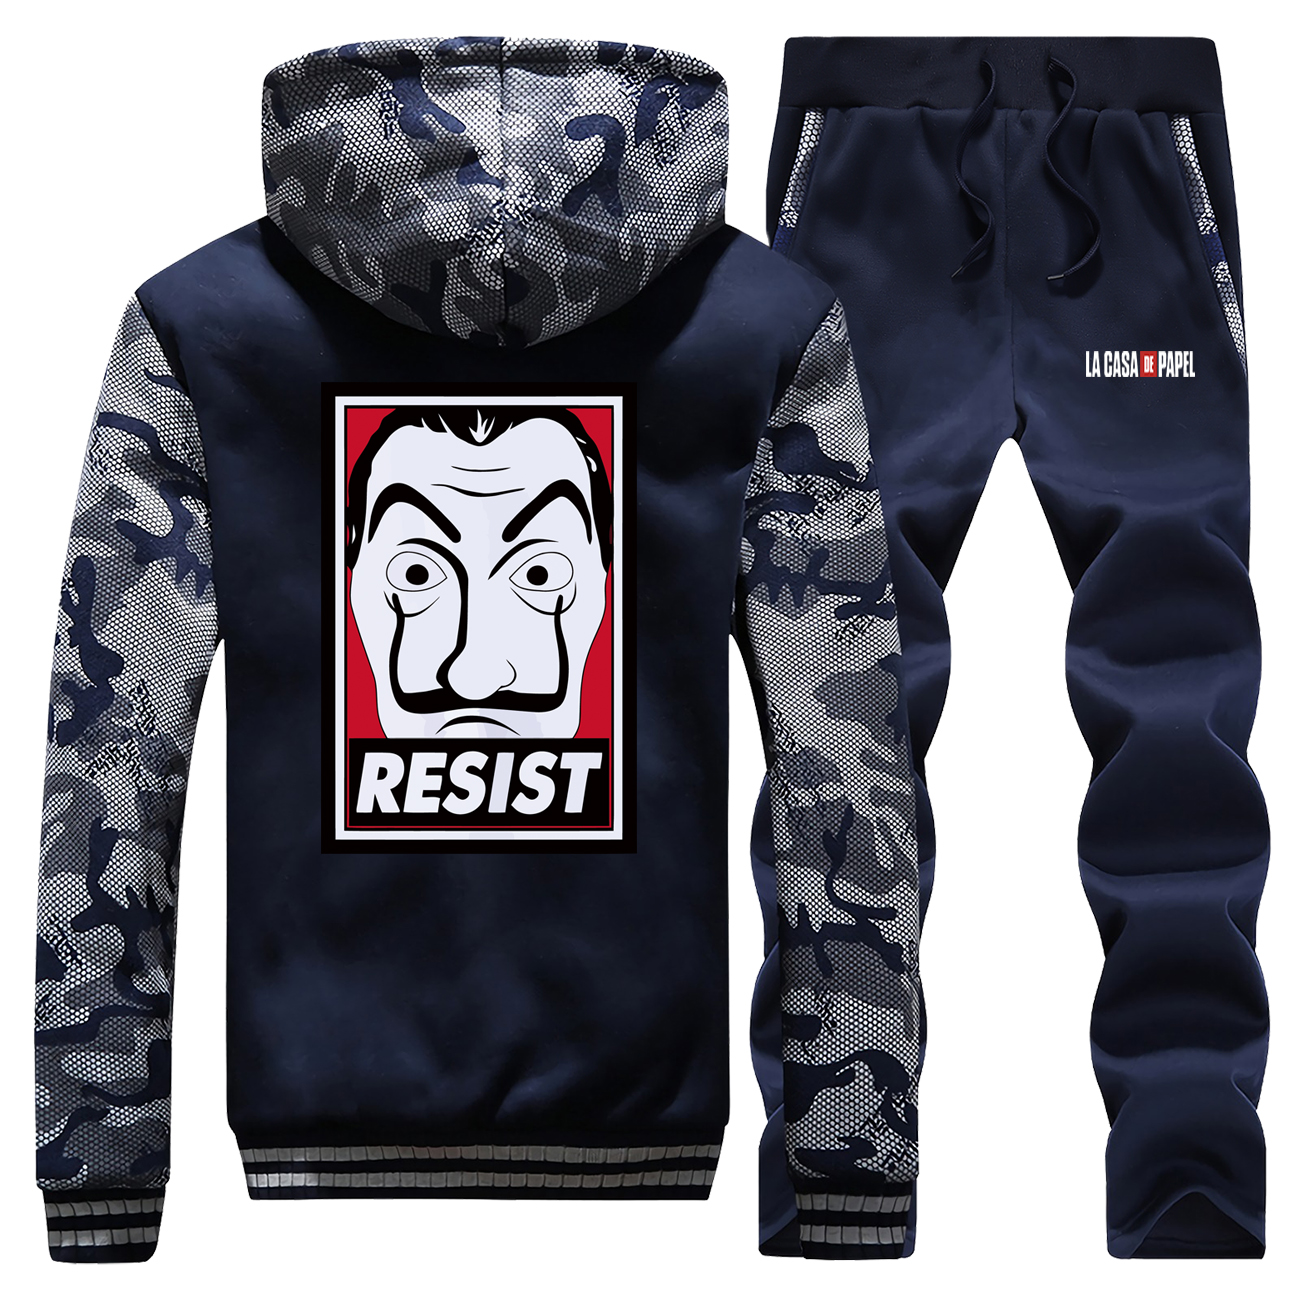 La Casa De Papel Thick Fleece Hoodie+Pants 2 Piece Sets Men Warm Suit Sweatshirt Hoodies Hip Hop Tracksuit Mens Winter Jacket